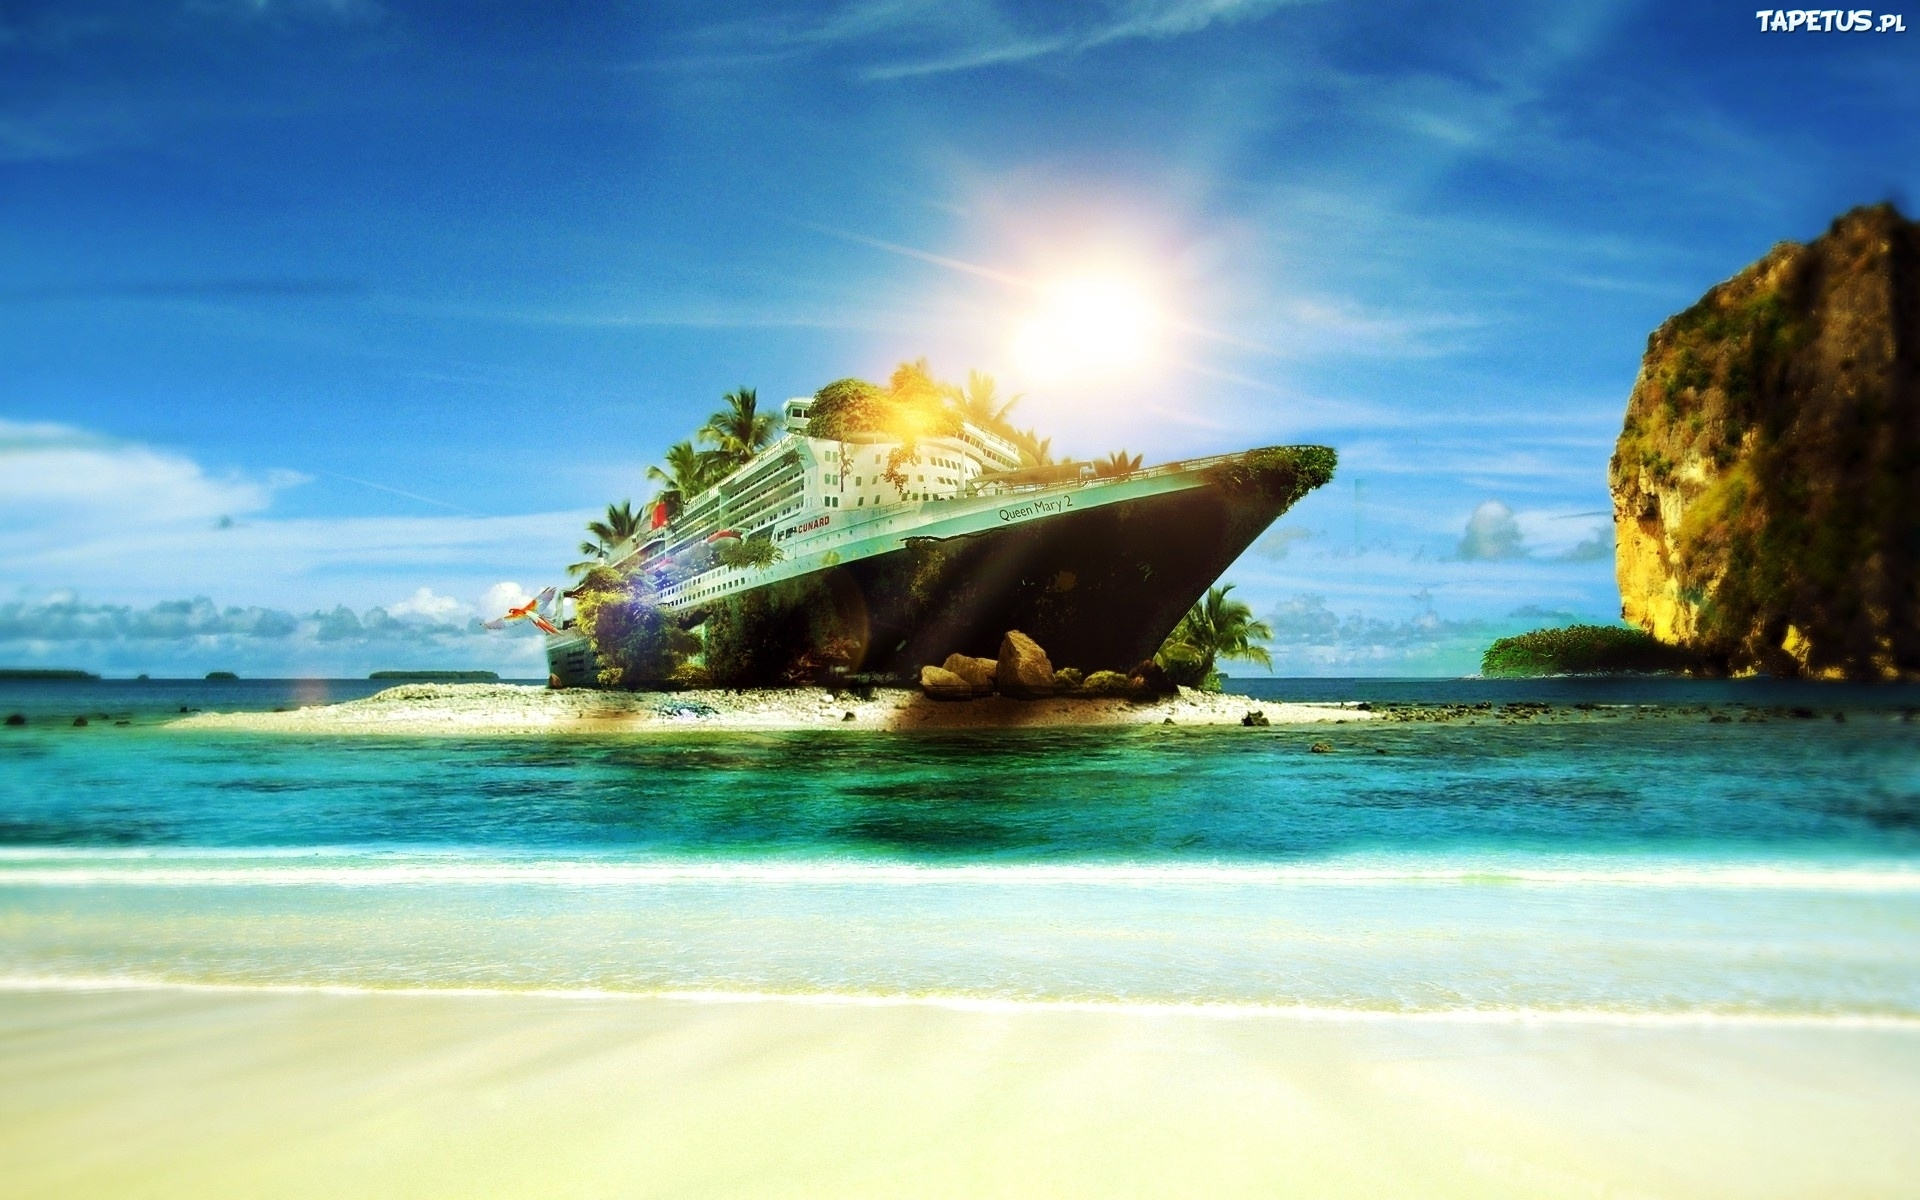 3840x2400 wallpaper ocean boat - photo #10